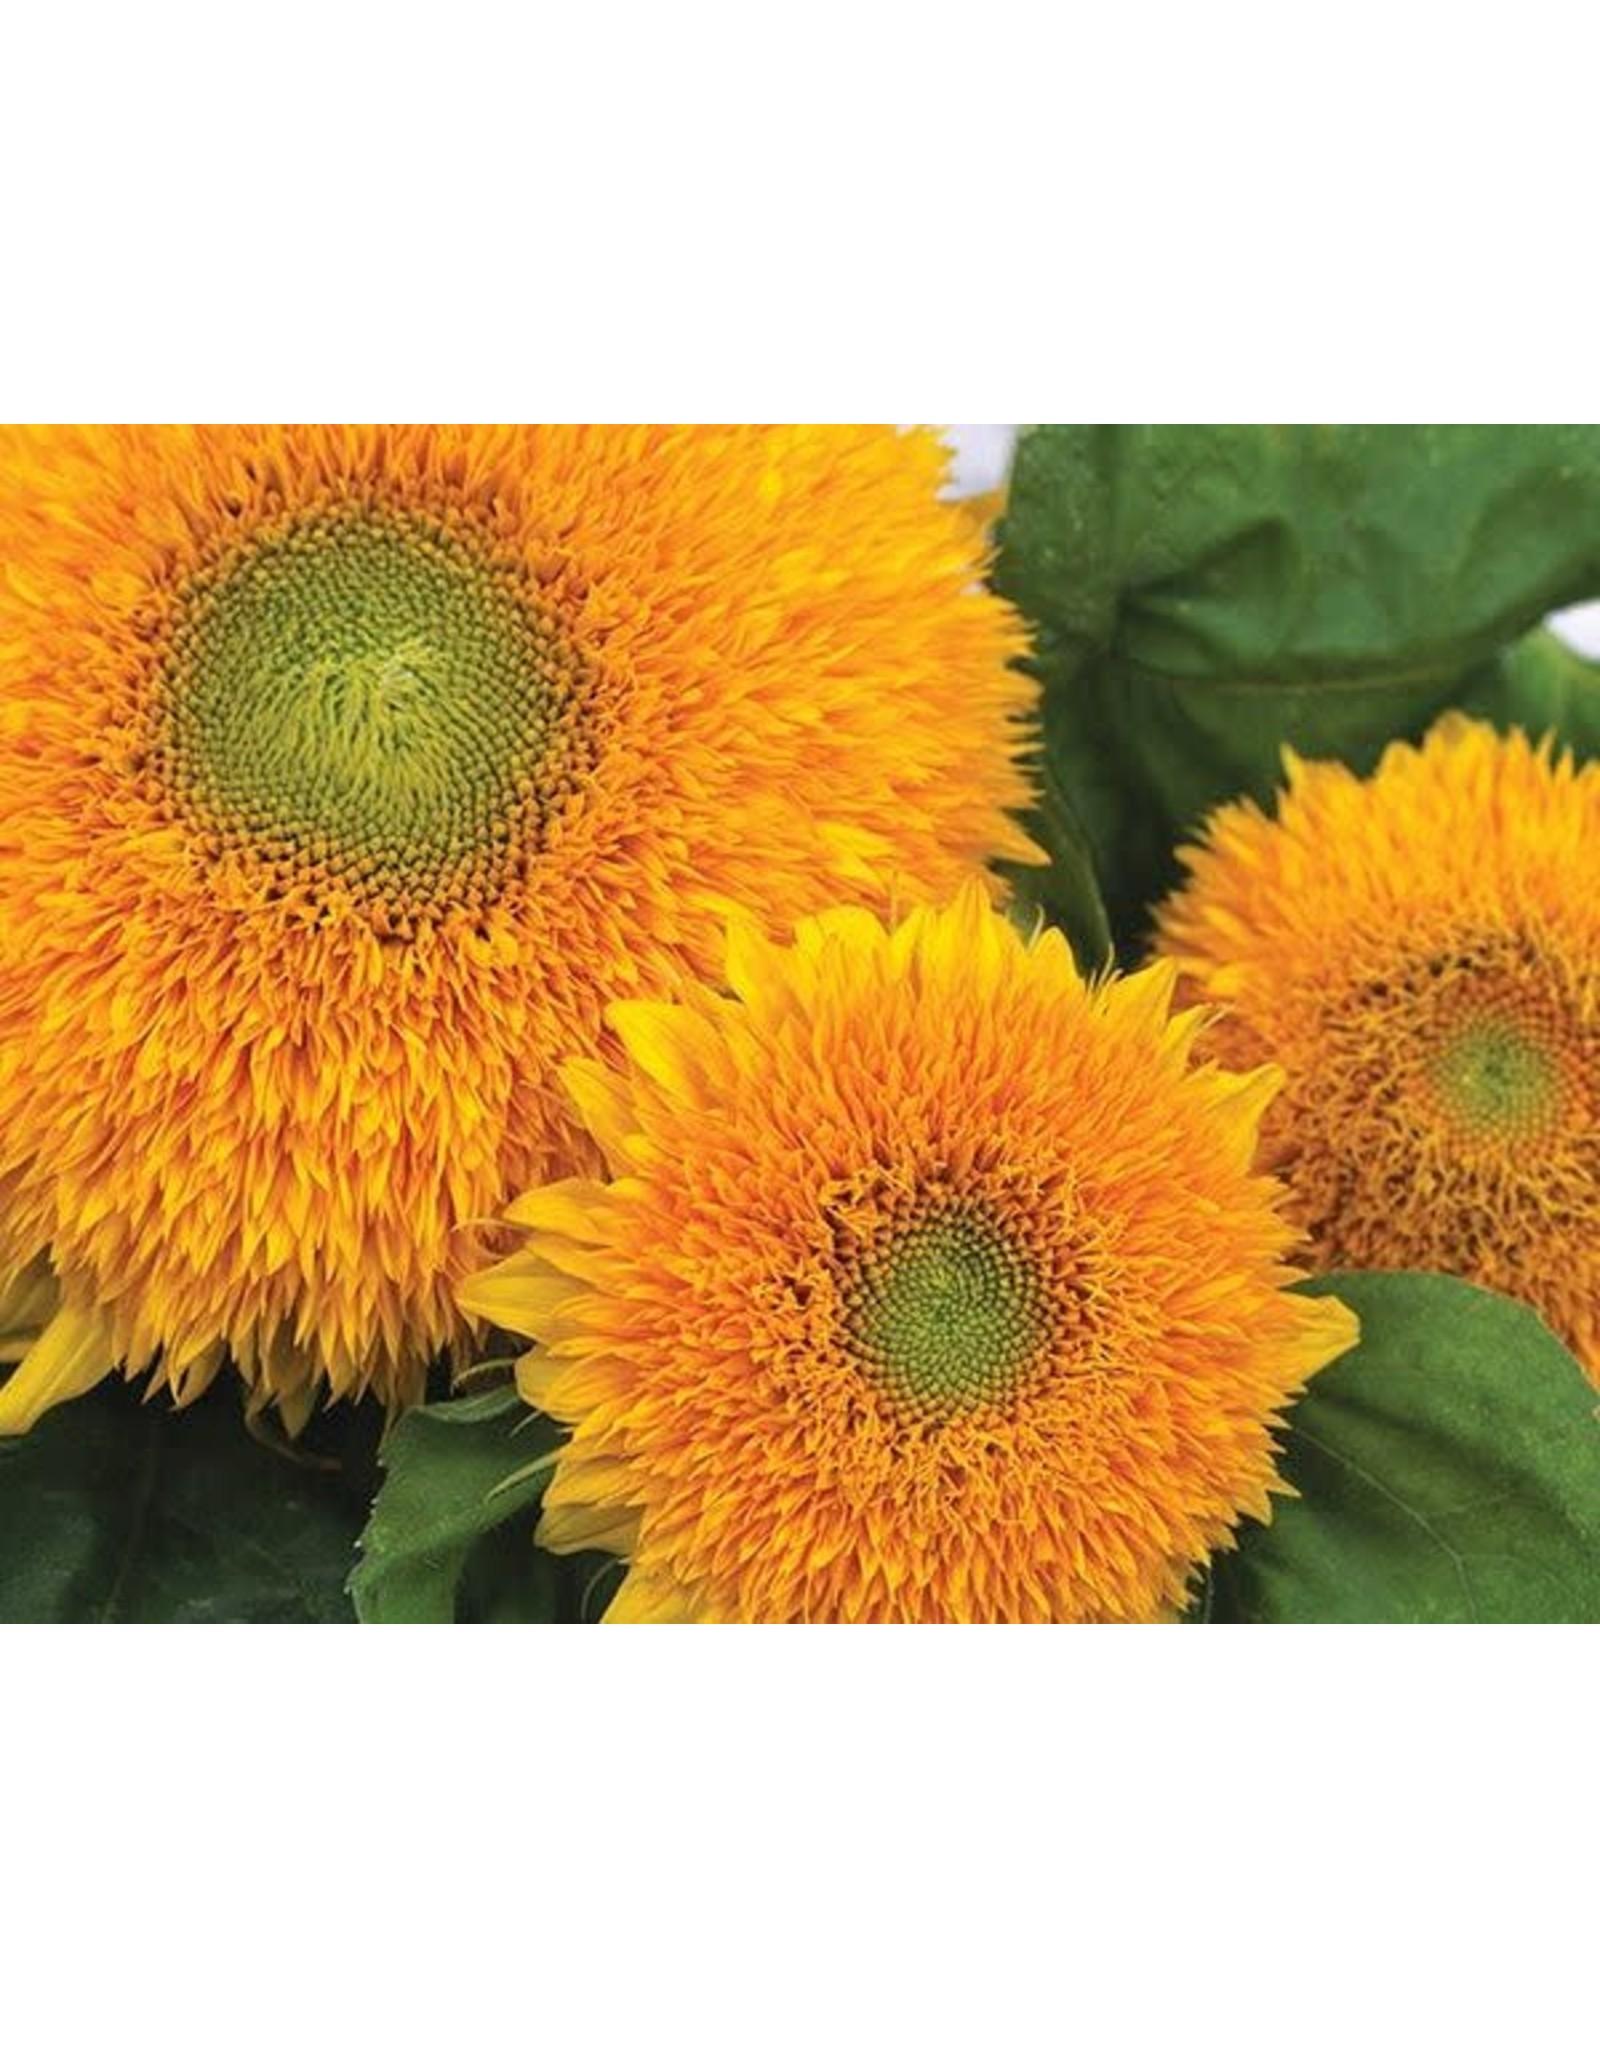 Seeds - Sunflower Dwarf Teddy Bear